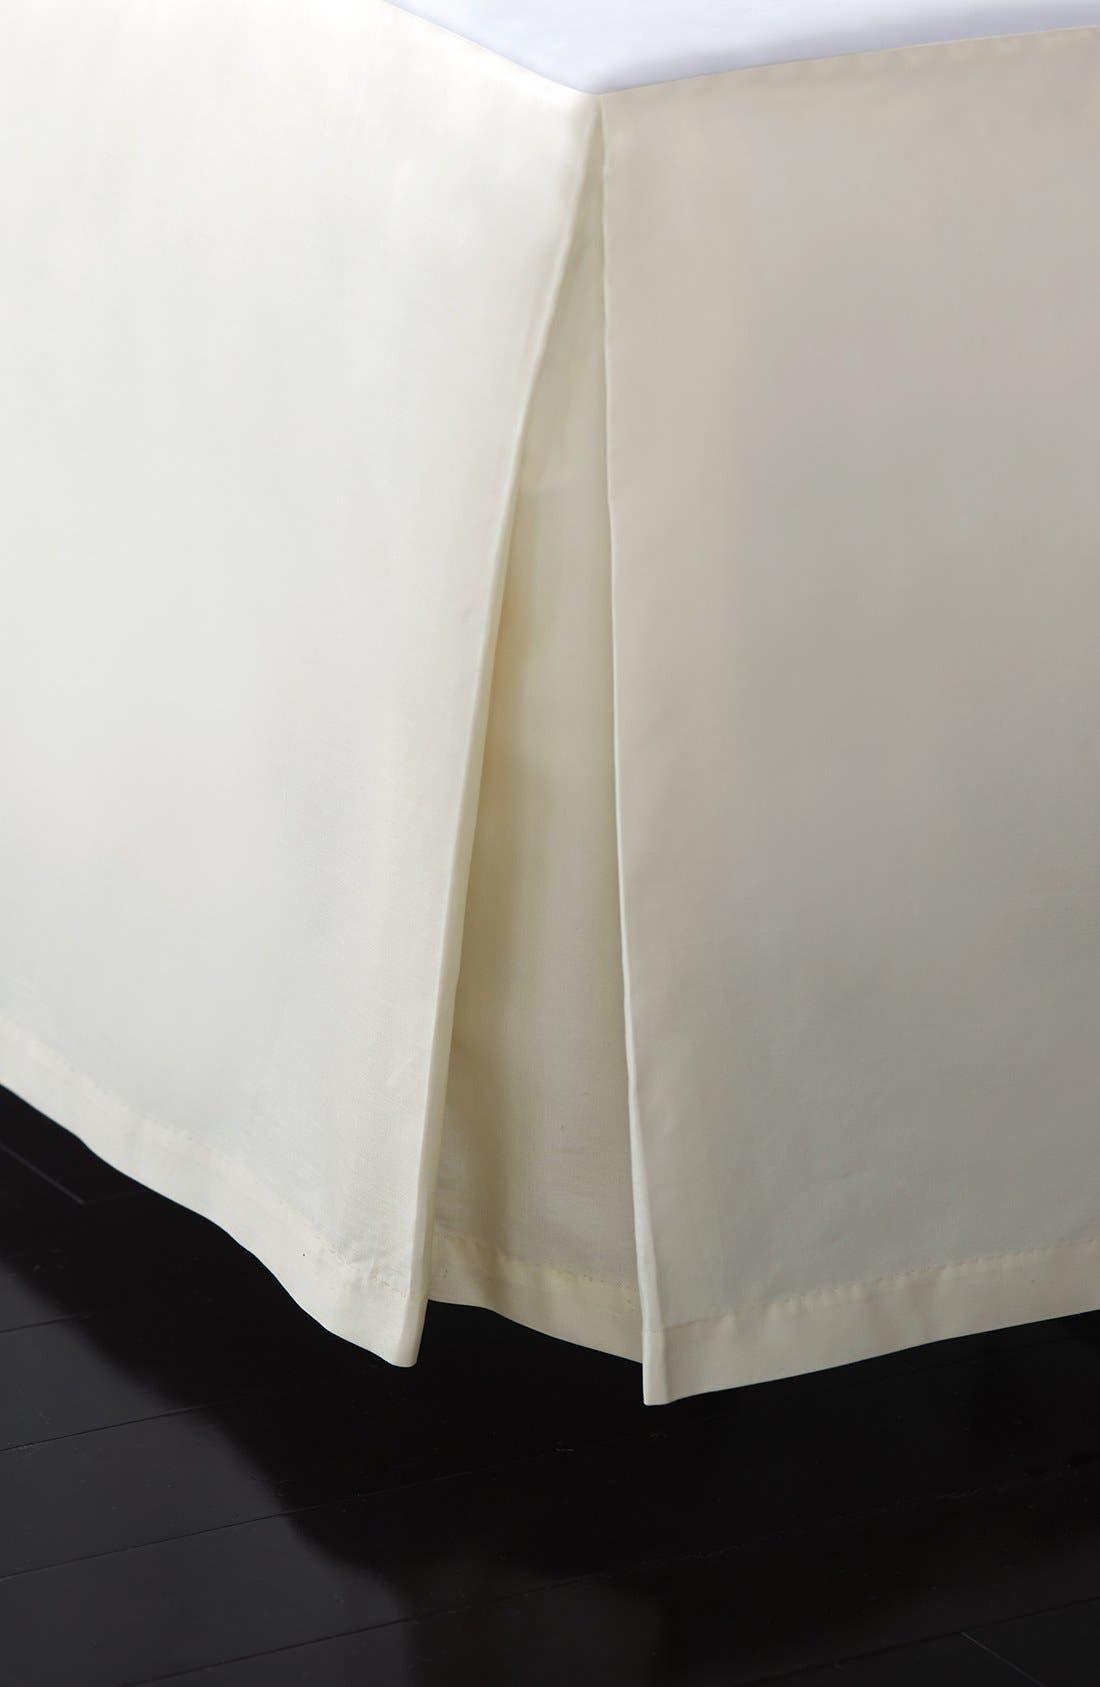 DONNA KARAN NEW YORK Donna Karan Collection 'Reflection' 510 Thread Count Bed Skirt, Main, color, IVORY